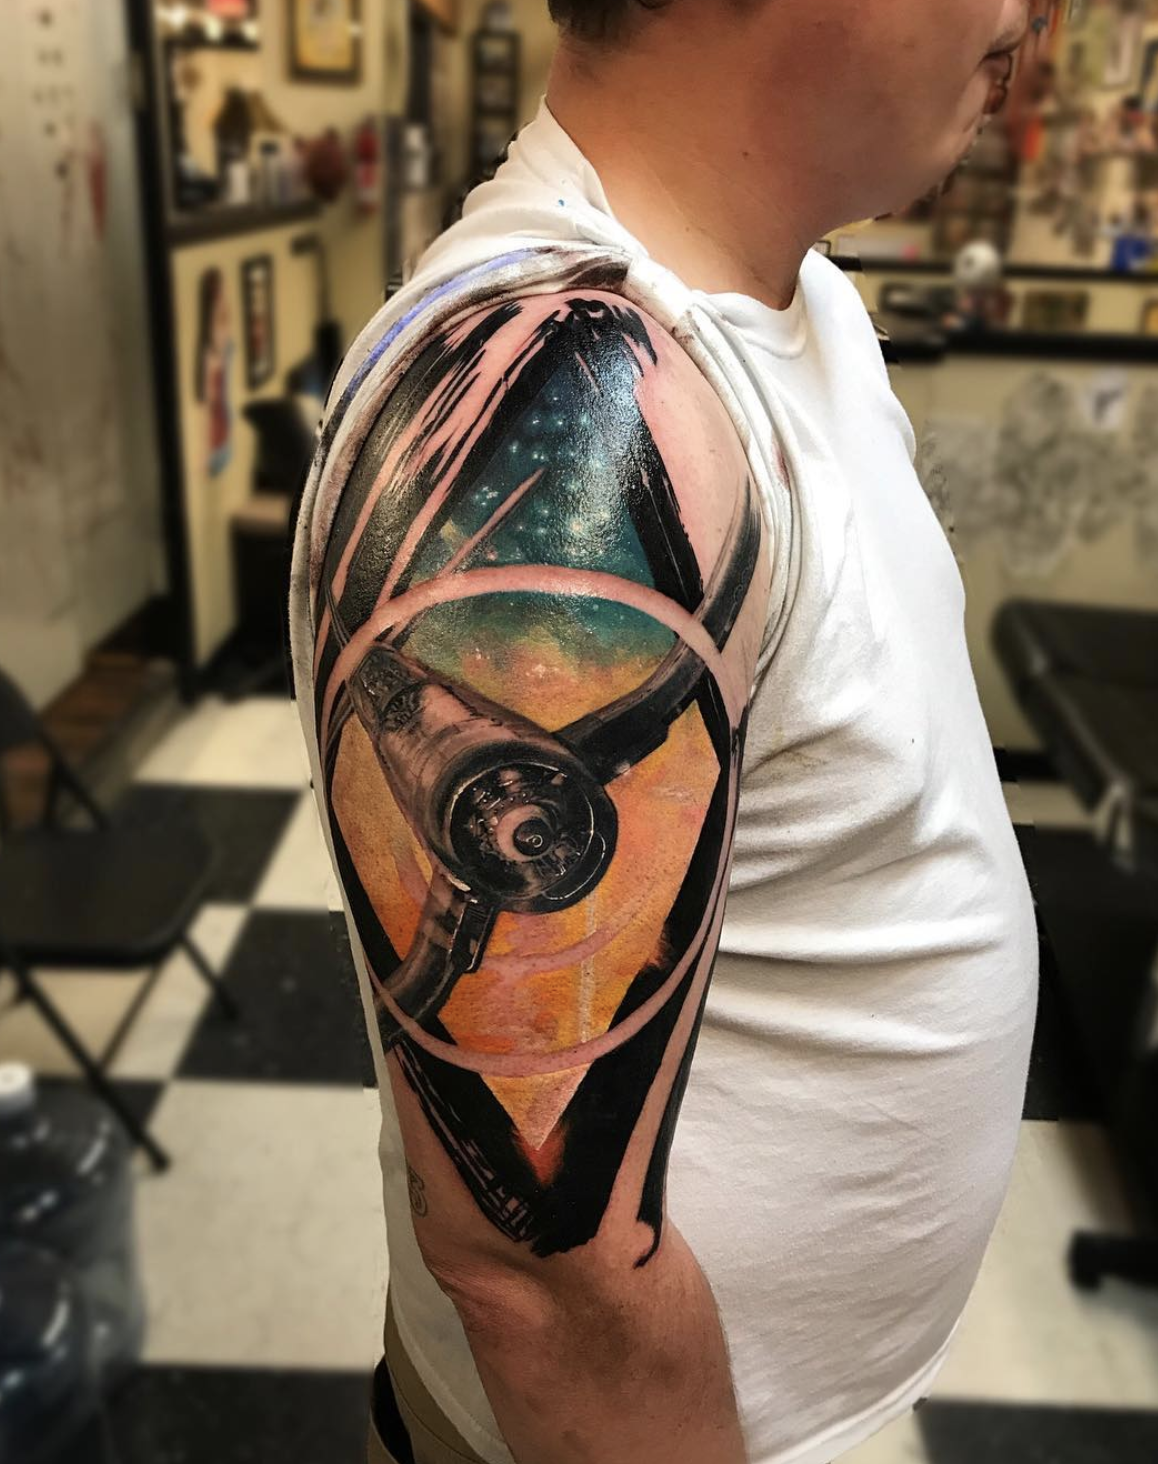 Lucas Eagleton - The Black Bison Tattoo Studio